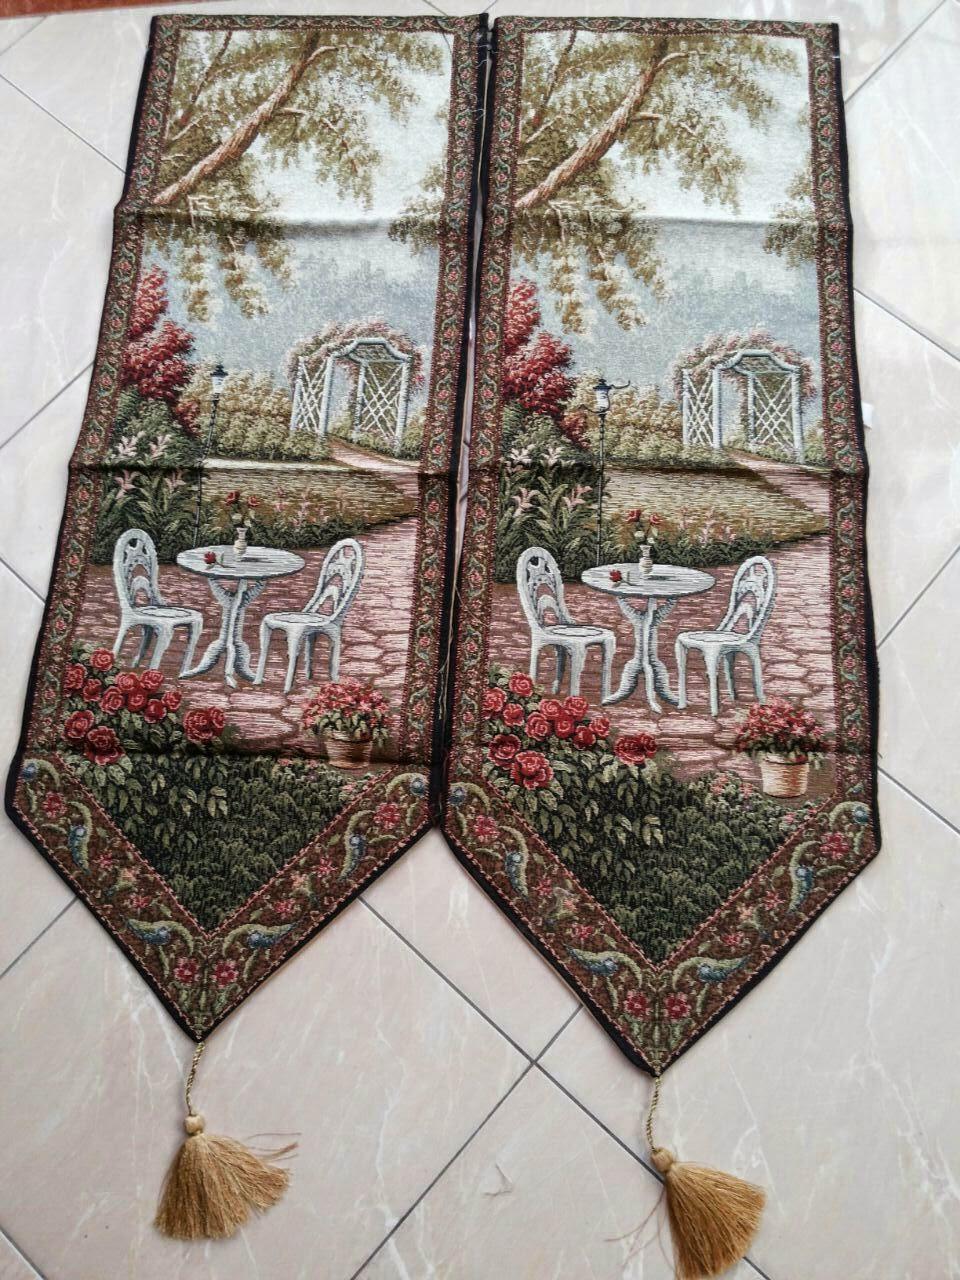 Hambal Tapestri Mekkah Madinah